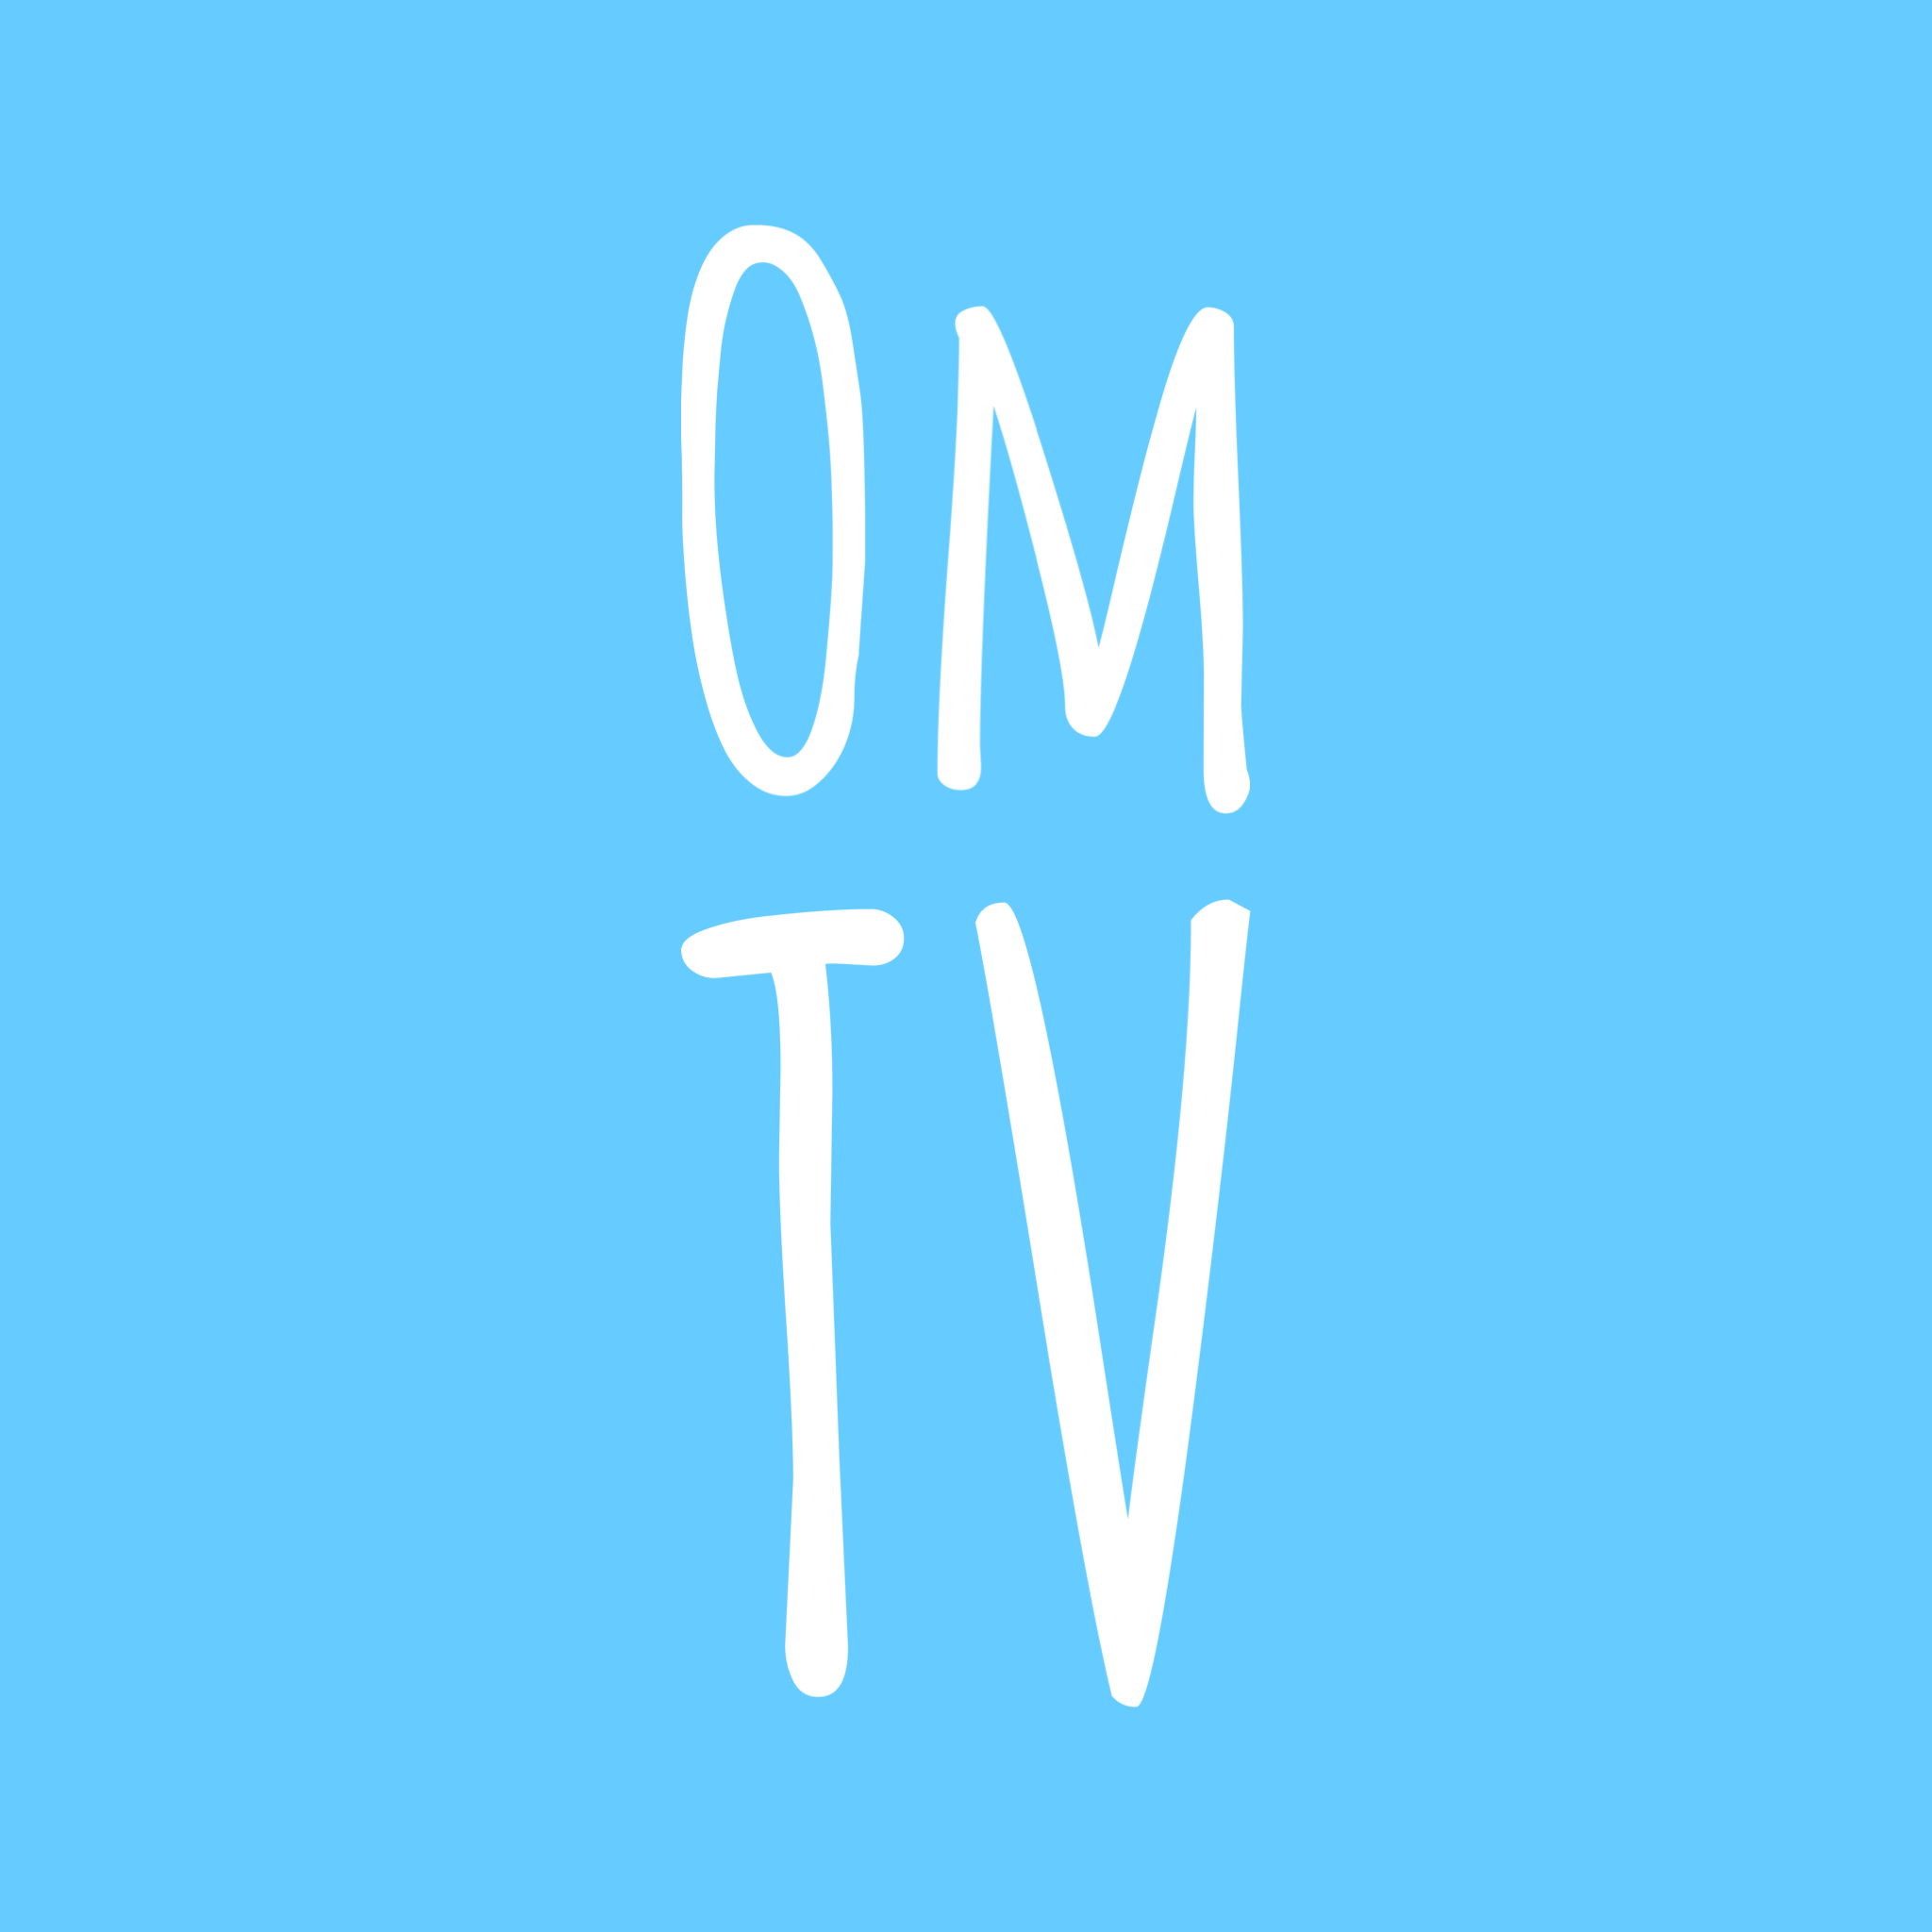 Om TV